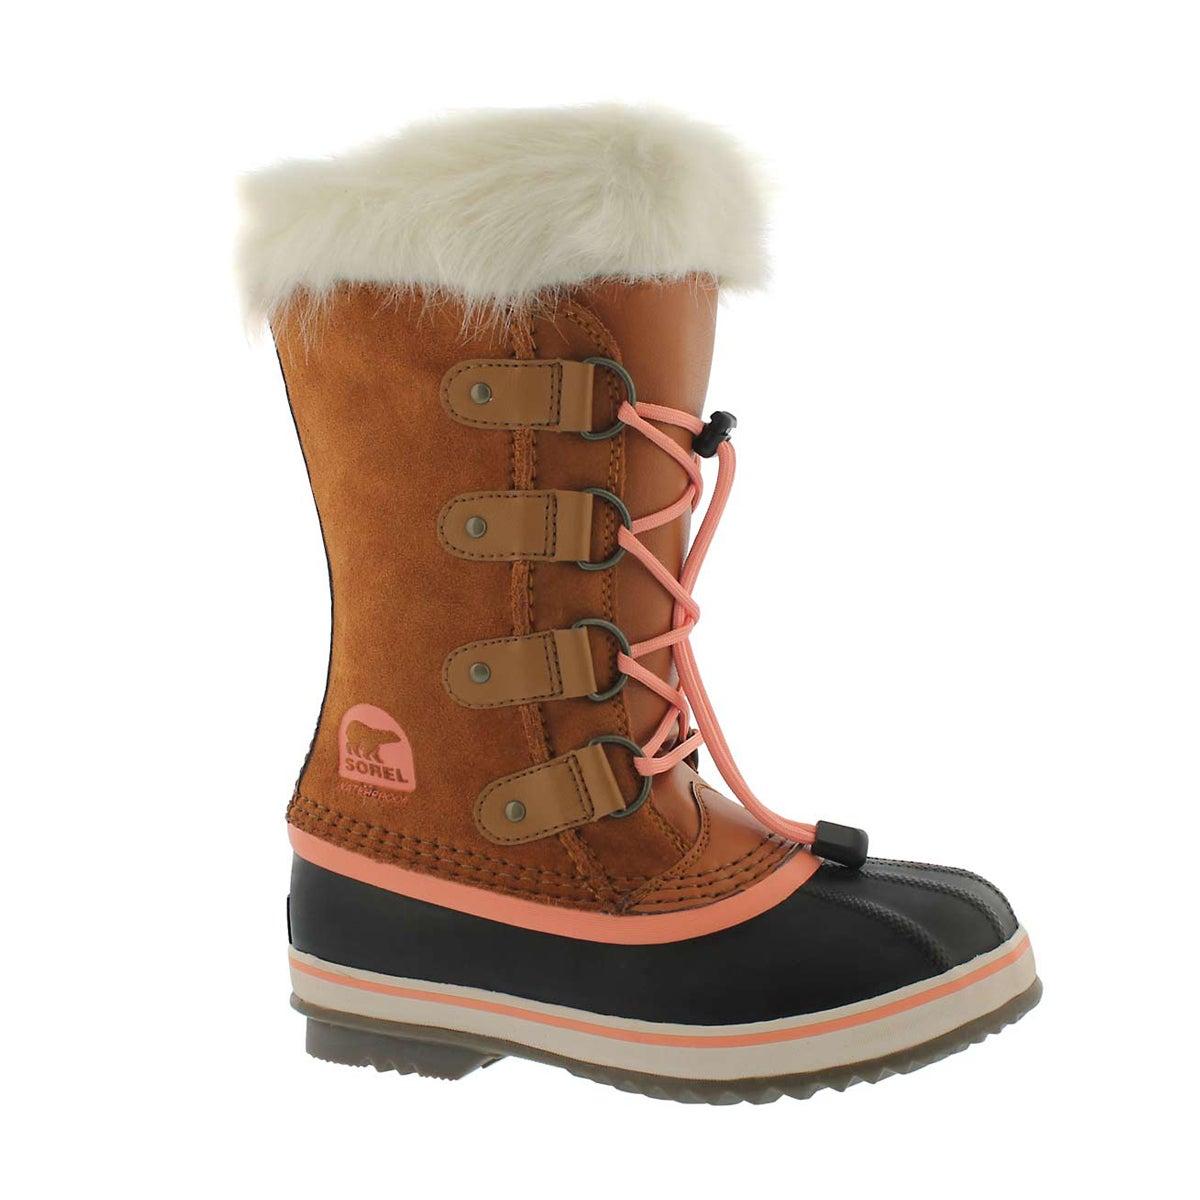 Girls' JOAN OF ARCTIC caramel winter boots